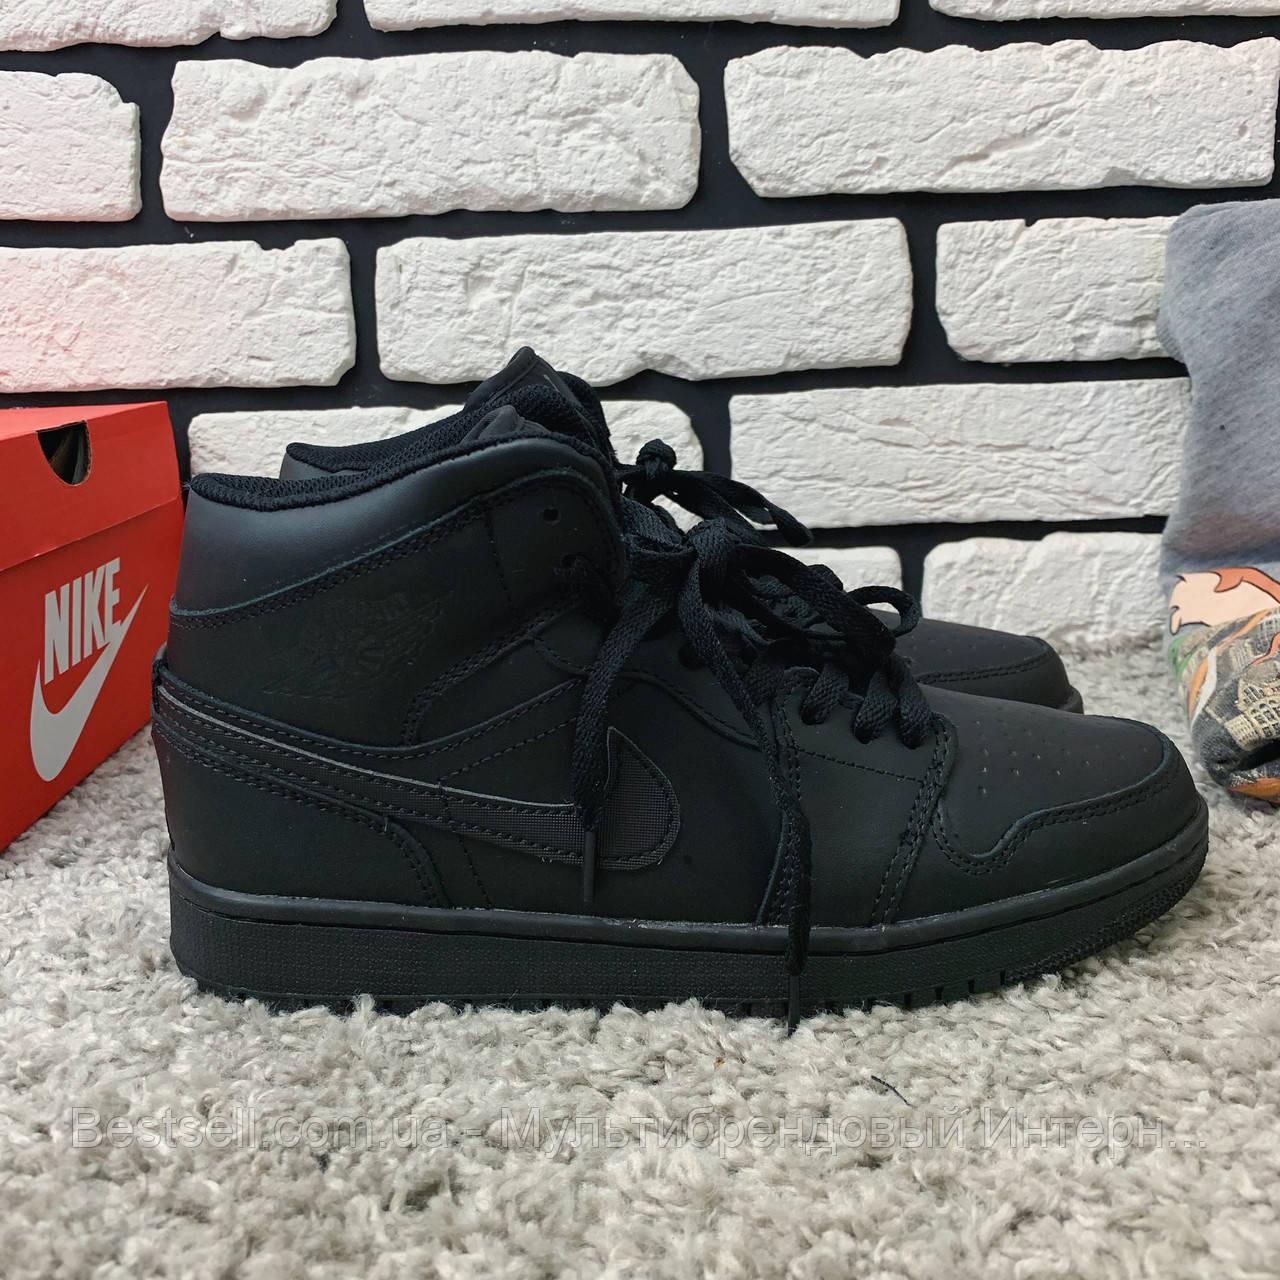 Зимние кроссовки (на меху) Nike Air Jordan  1-067 ⏩ [ 46 последний размер ]